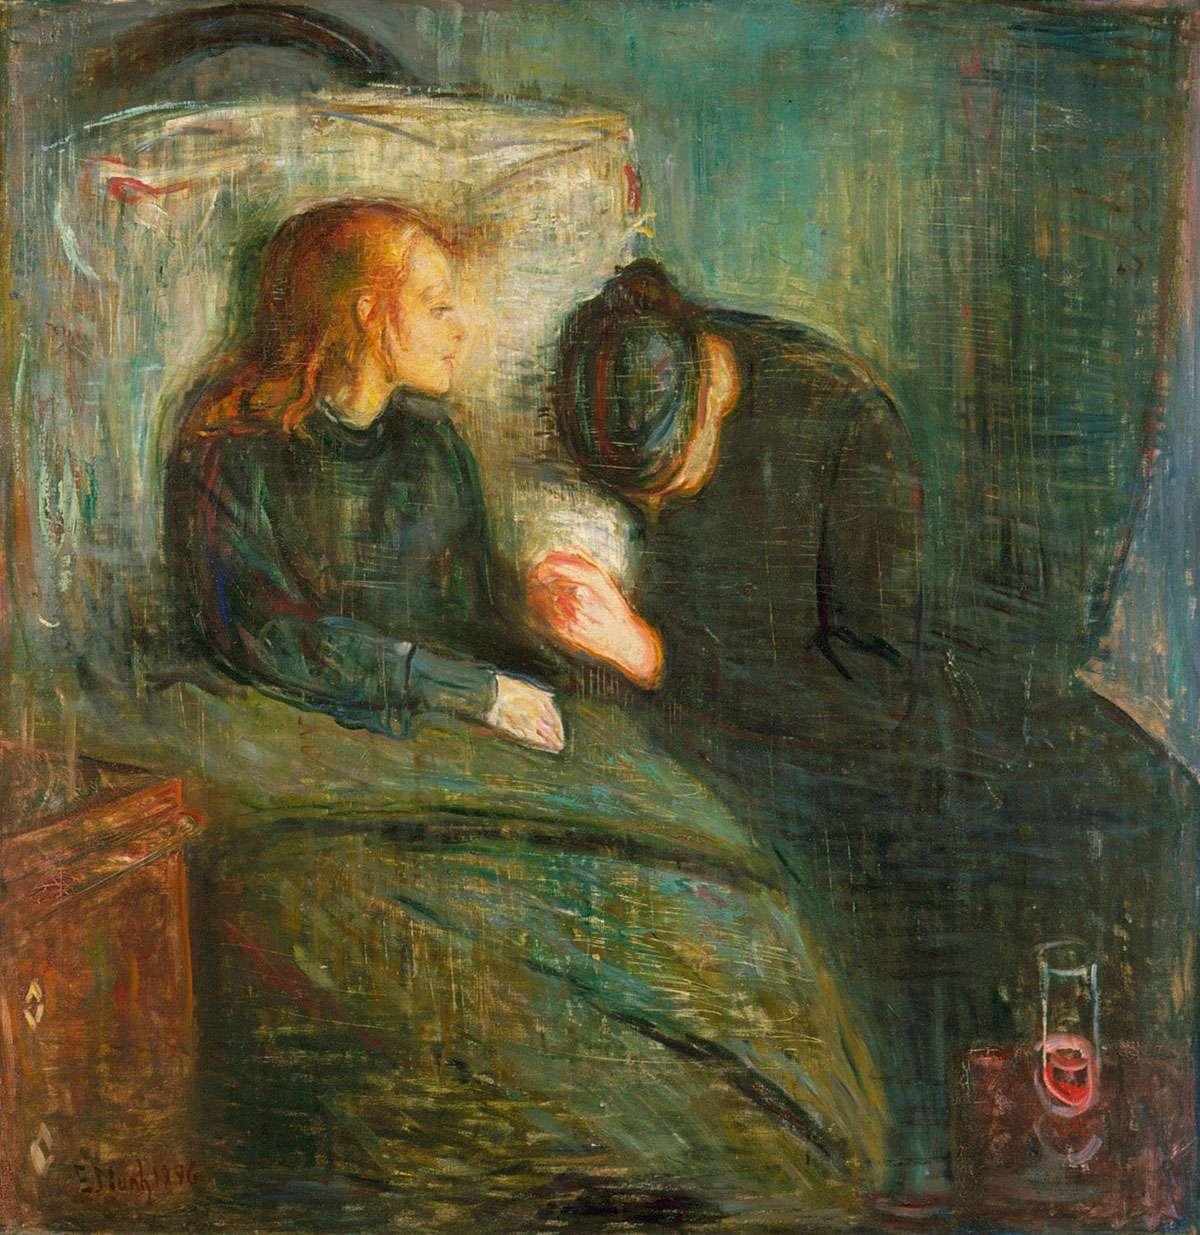 The Sick Child - Edvard Munch - 1896 - [Public domain], via Wikimedia Commons